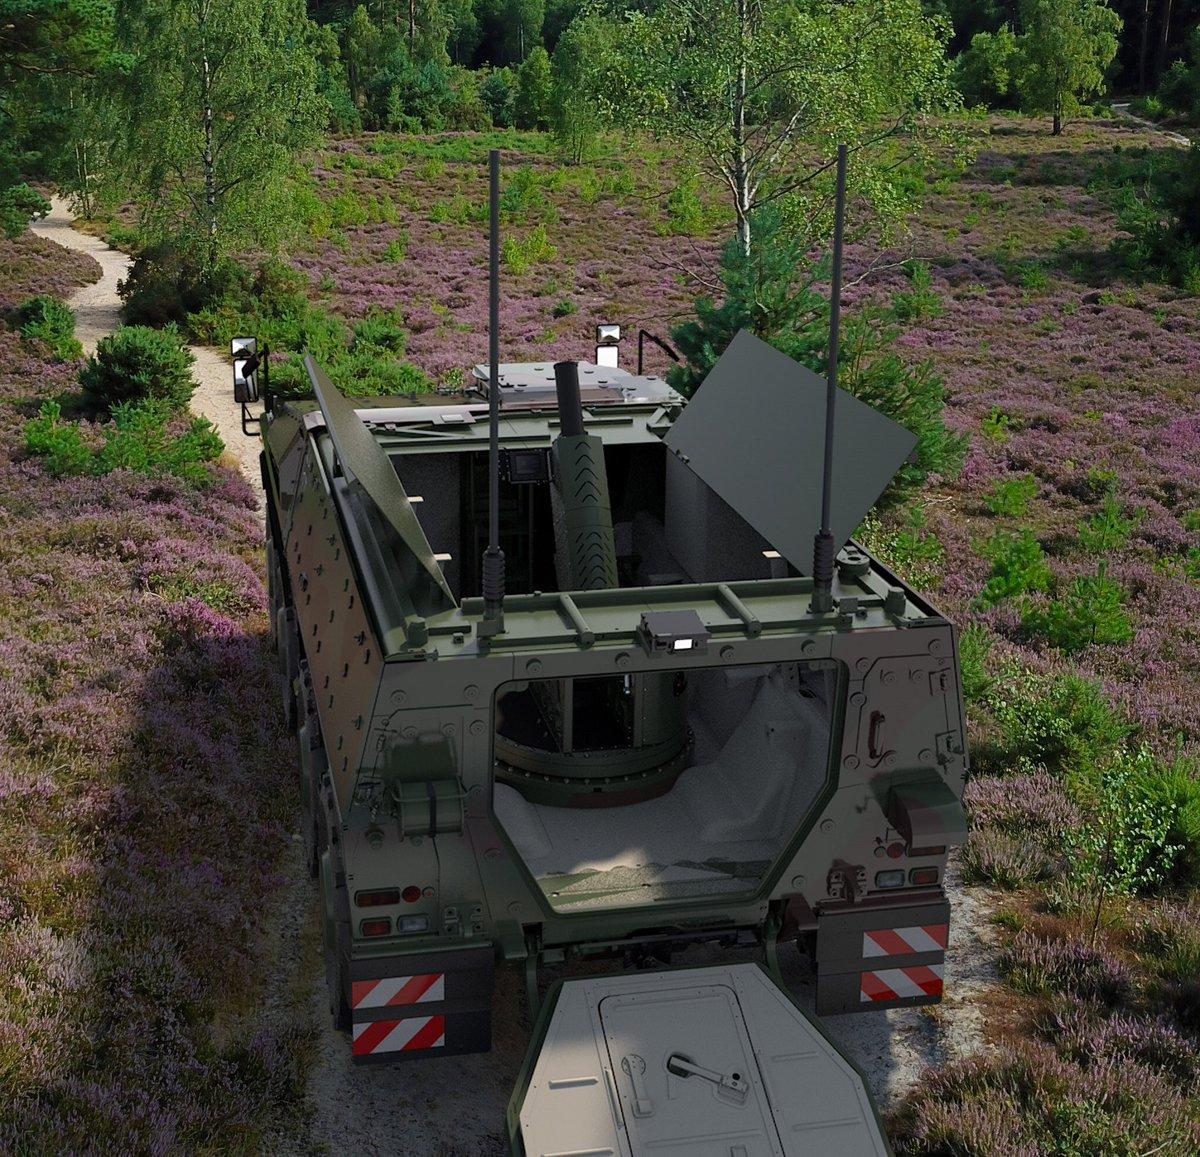 #Rheinmetall and @RH_BAES_Land unveil first ever #Boxer with mortar mission module at #DSEI2021   rheinmetall.com/en/media/edito…  #DSEI #defence #army